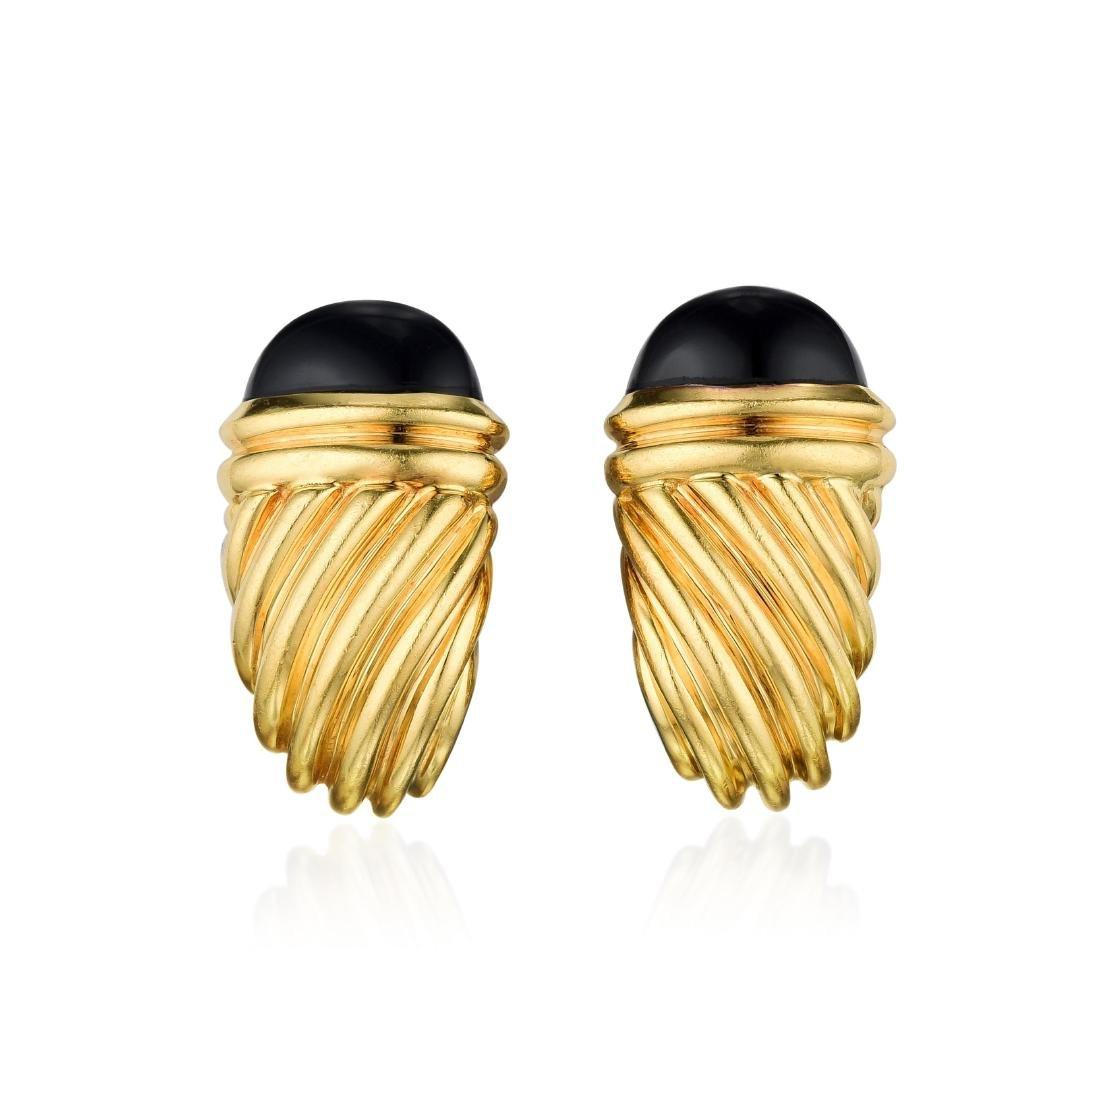 David Yurman Onyx and Gold Earrings